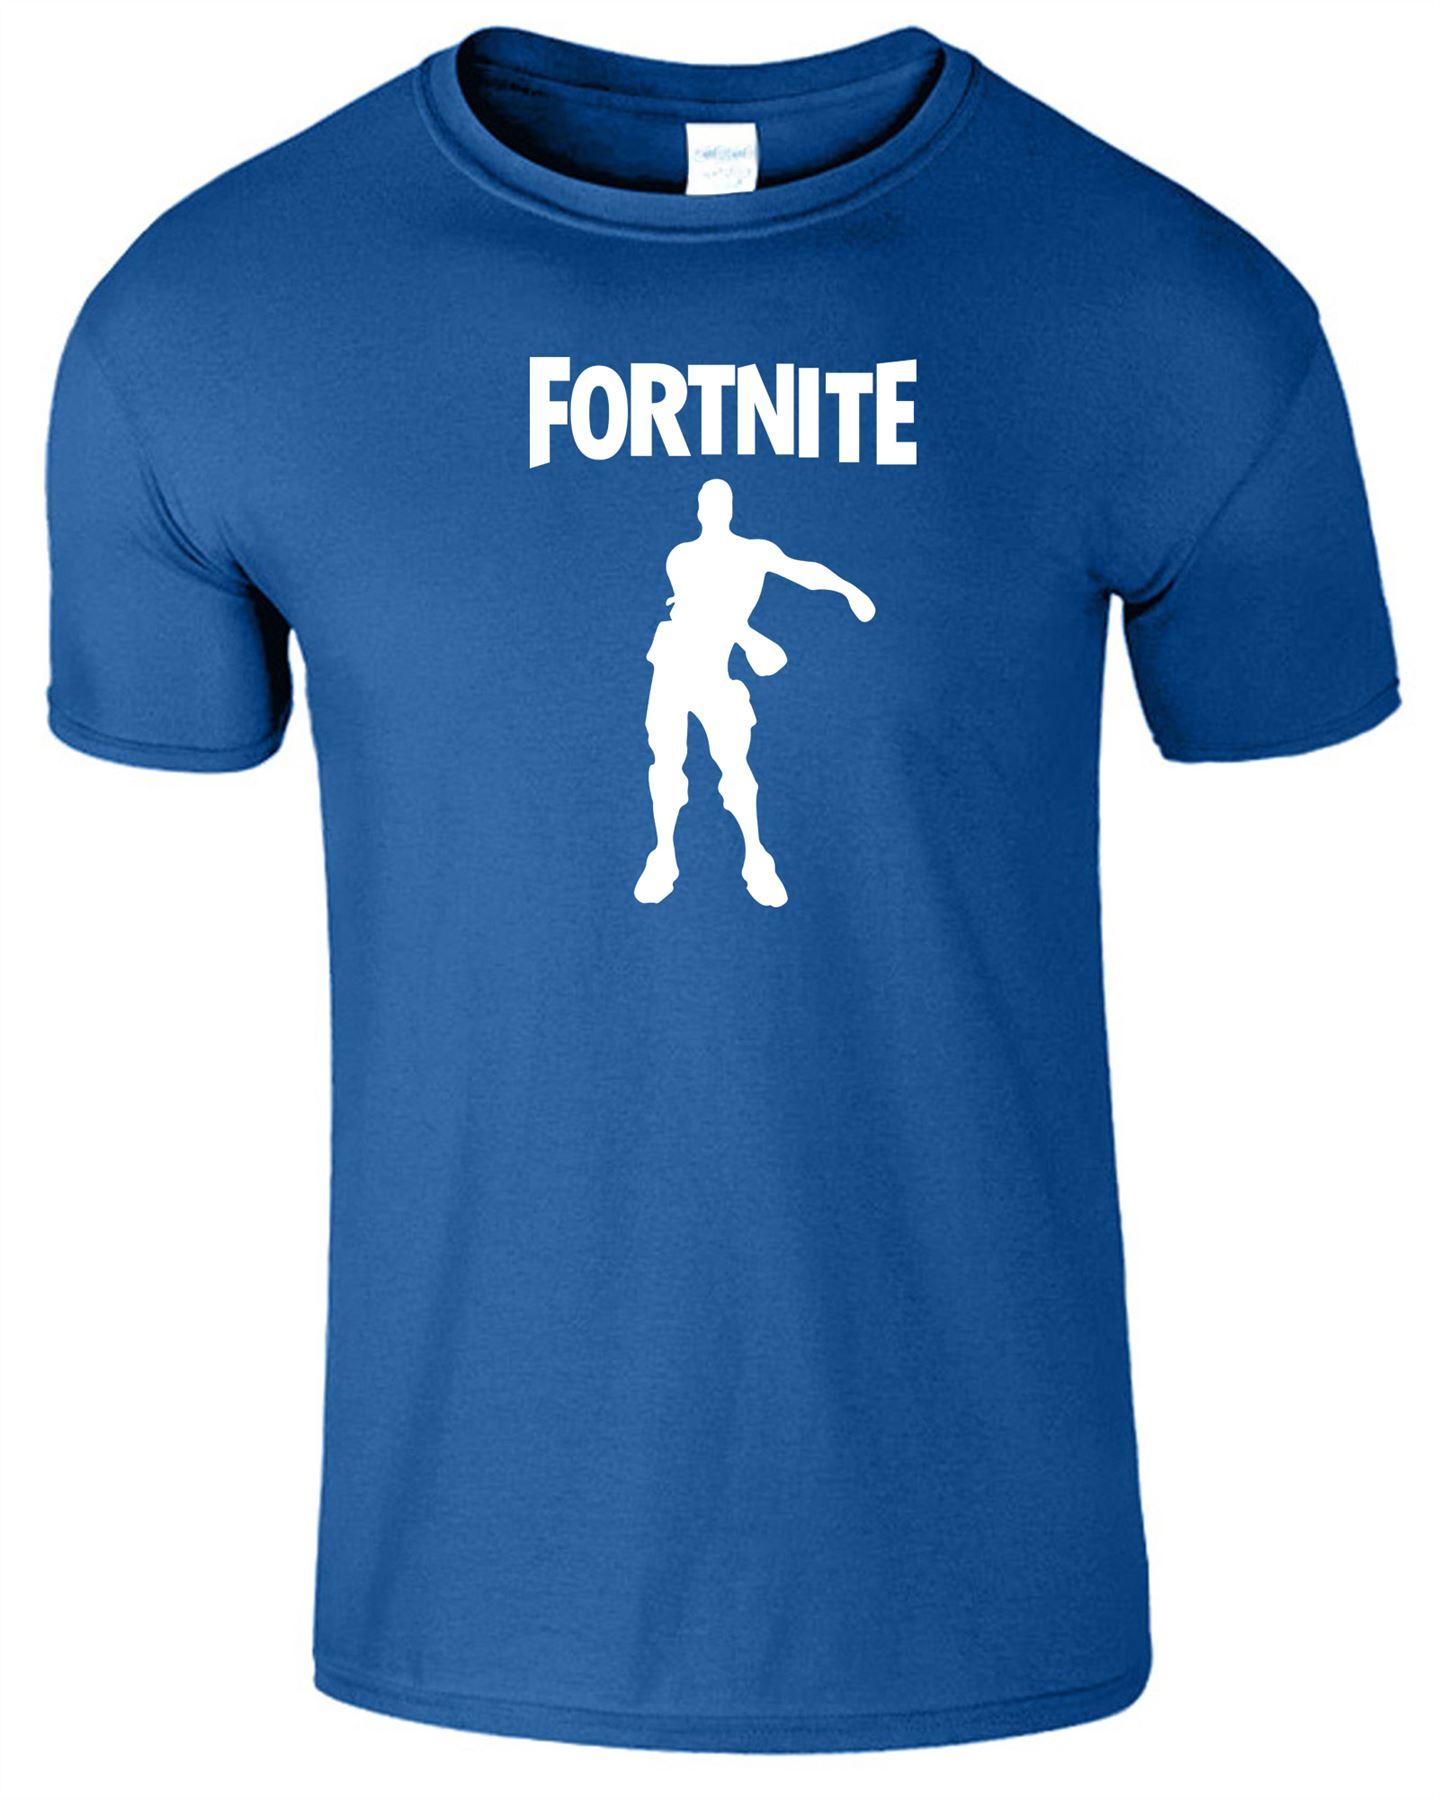 Fortnite-T-Shirt-celebraciones-para-Hombre-Adulto-Ninos-Nino-Kid-039-s-Juego-Dance-DAB